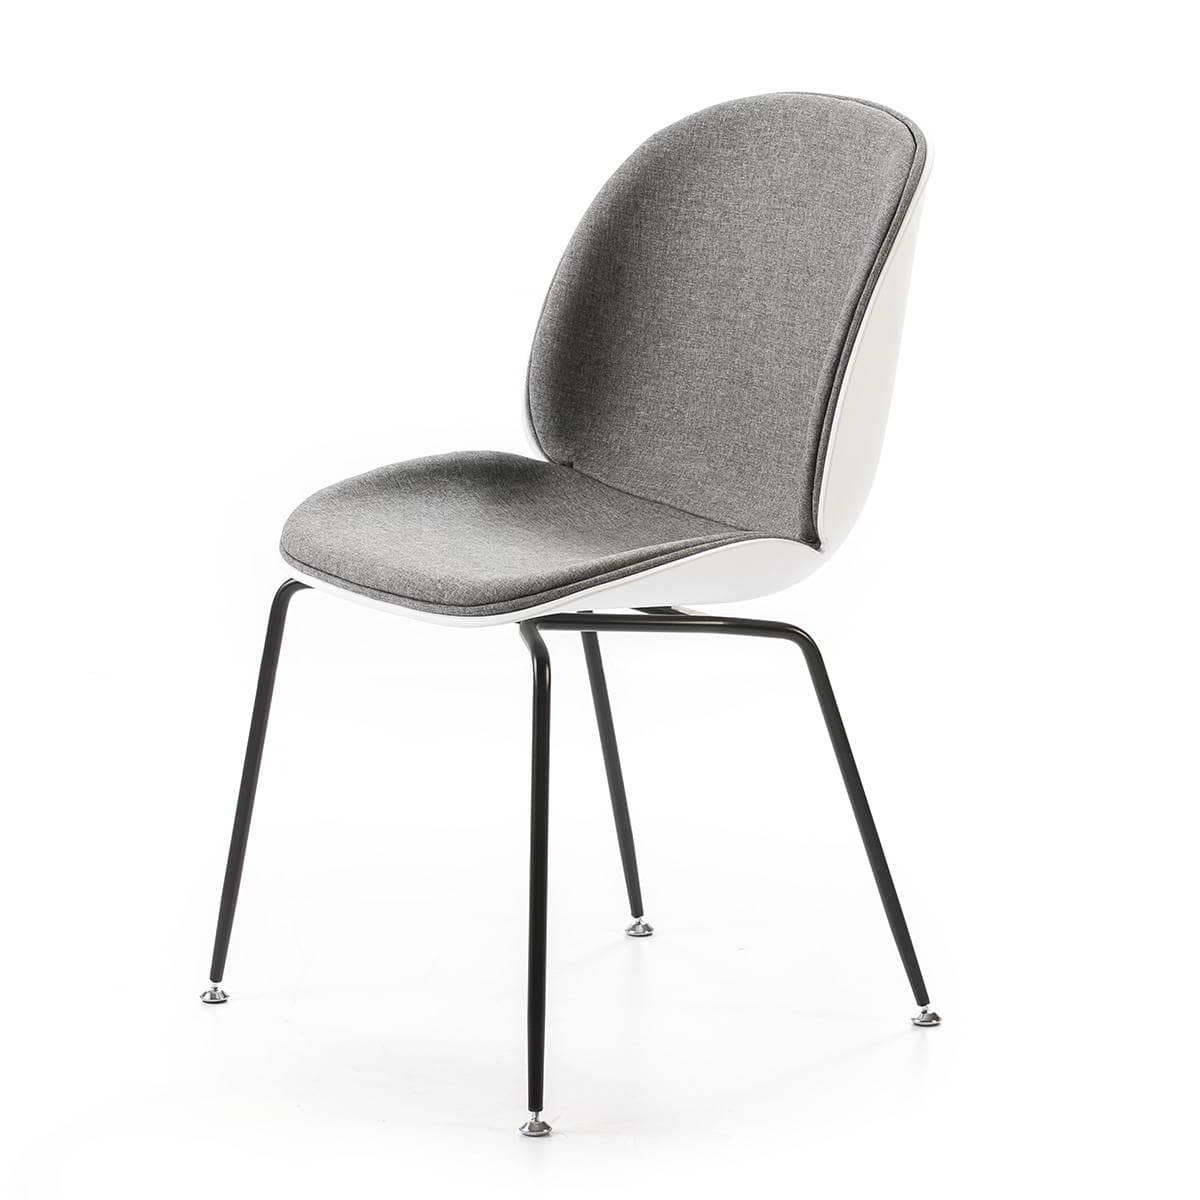 silla-gris-comoda-online